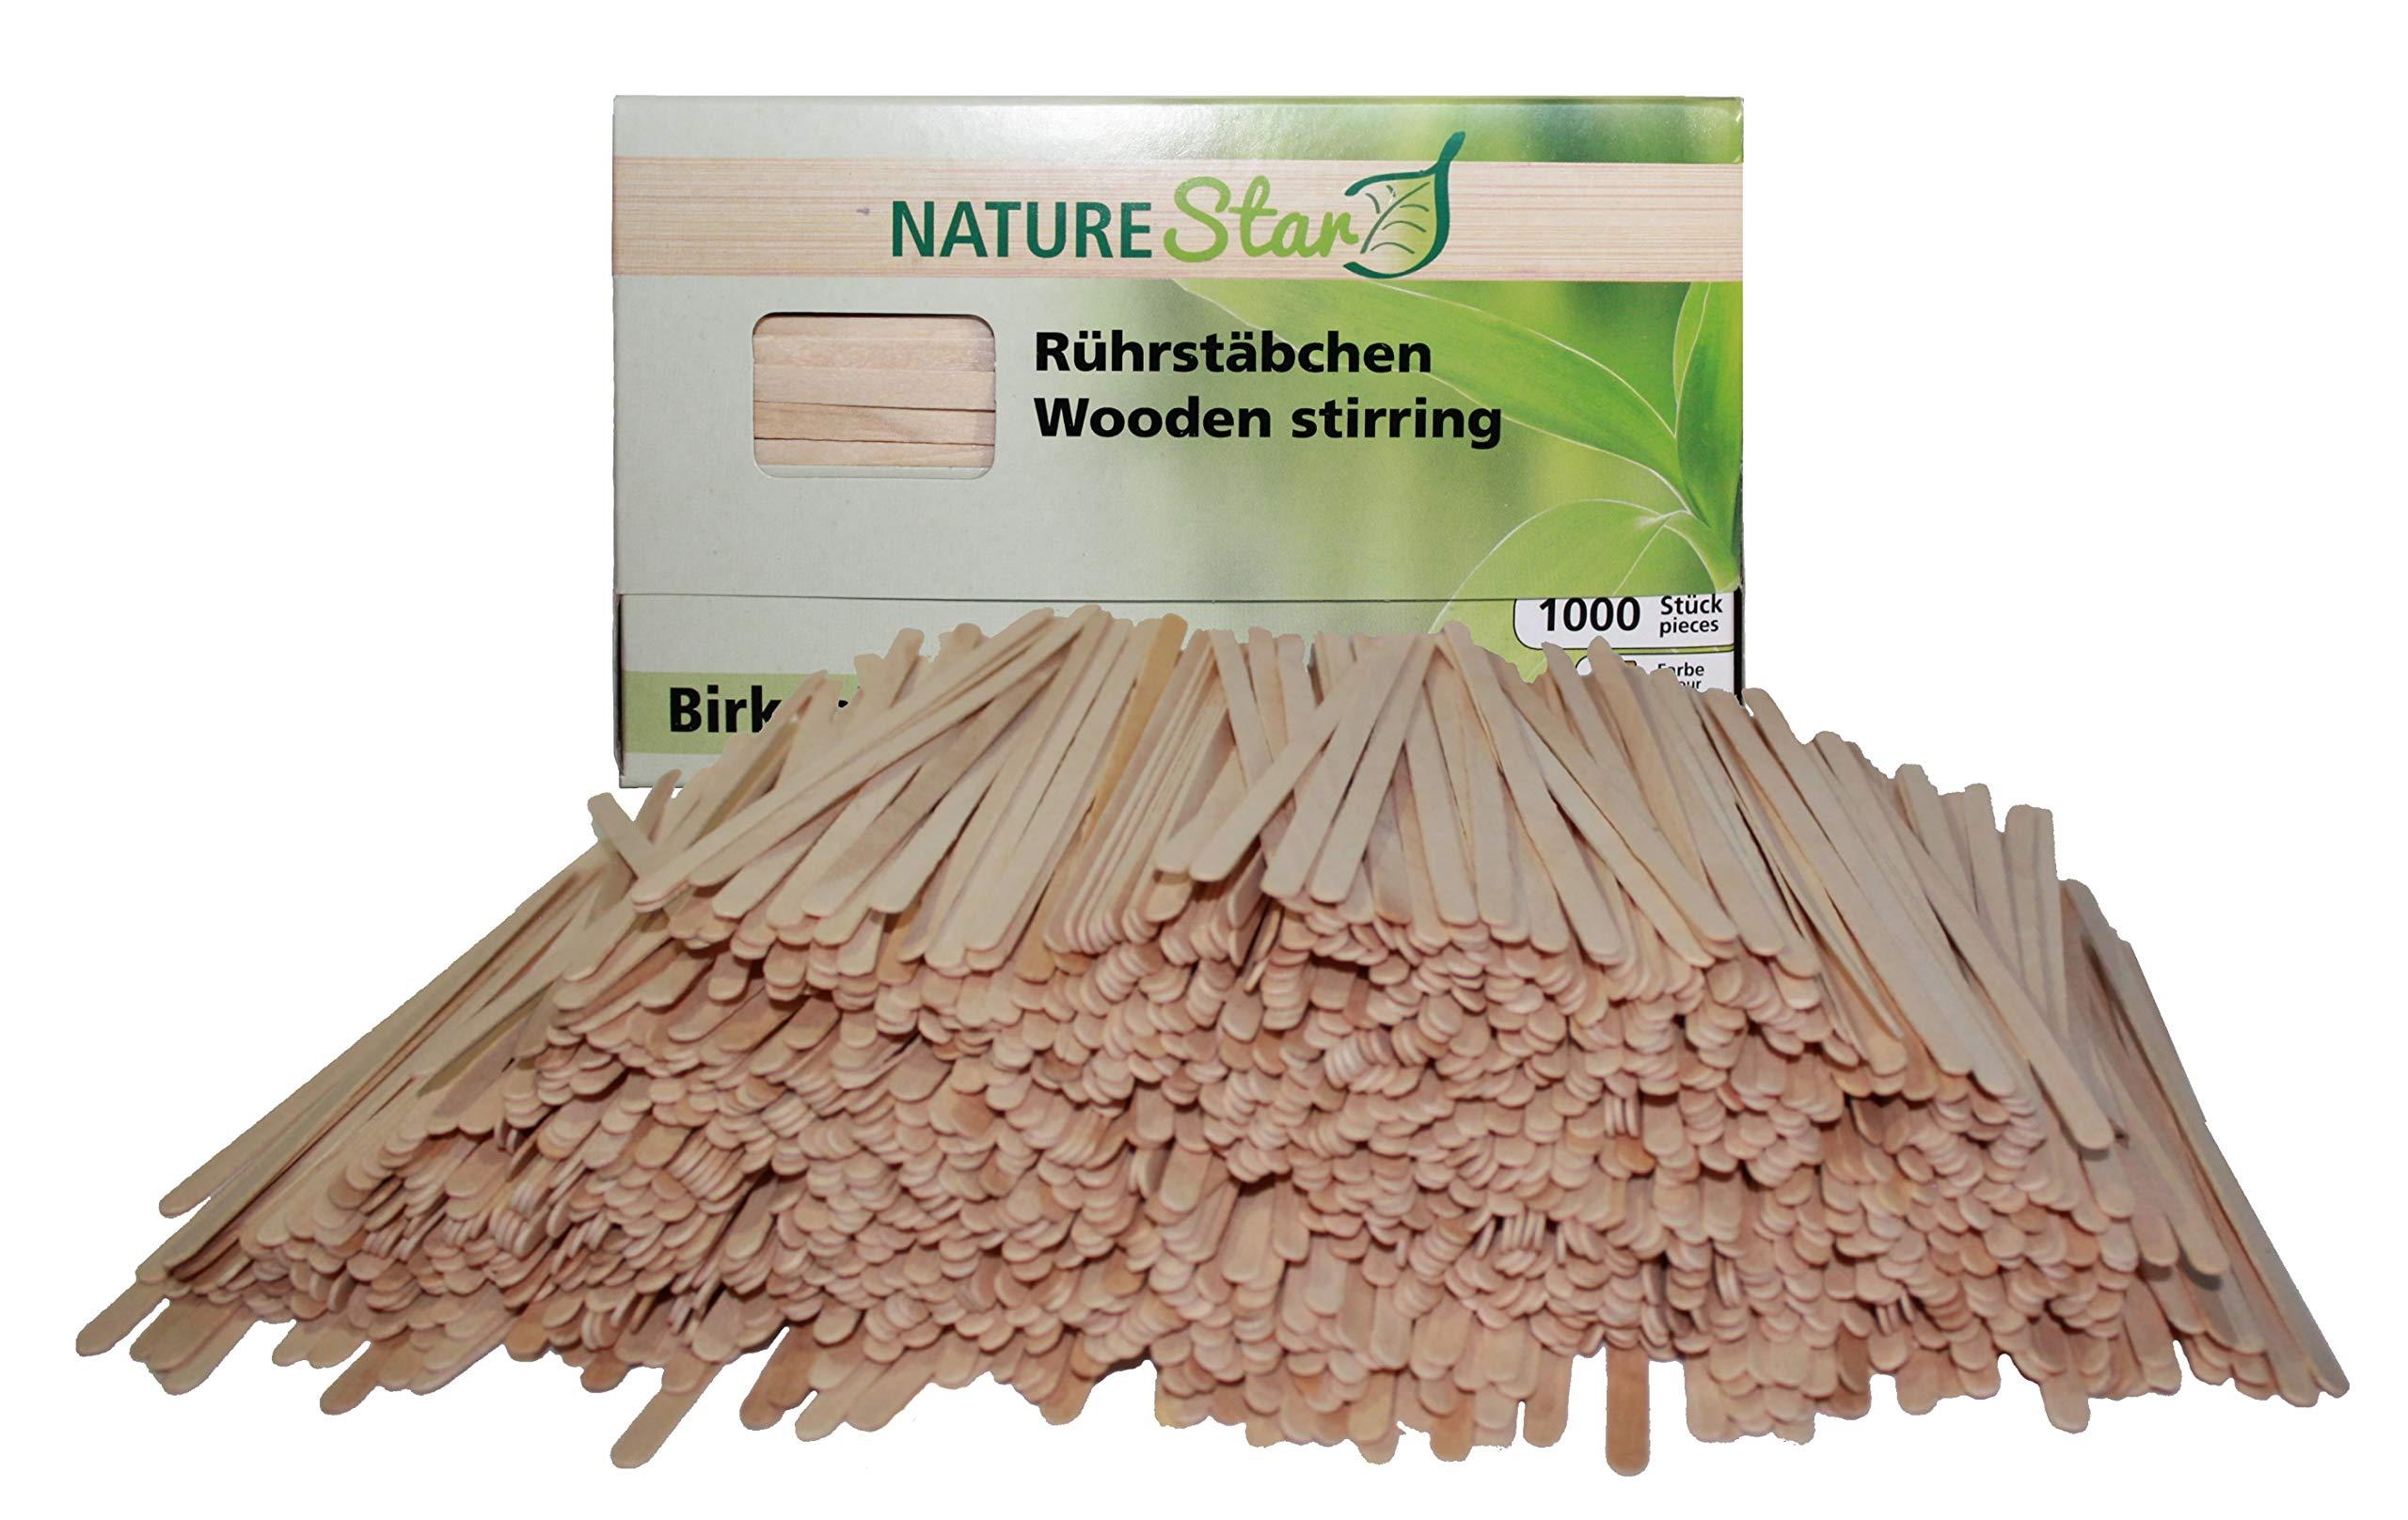 1000 Coffee Stir Sticks Wood Disposable Swizzle Stirrer Wooden Best For Hot/Cold Beverage